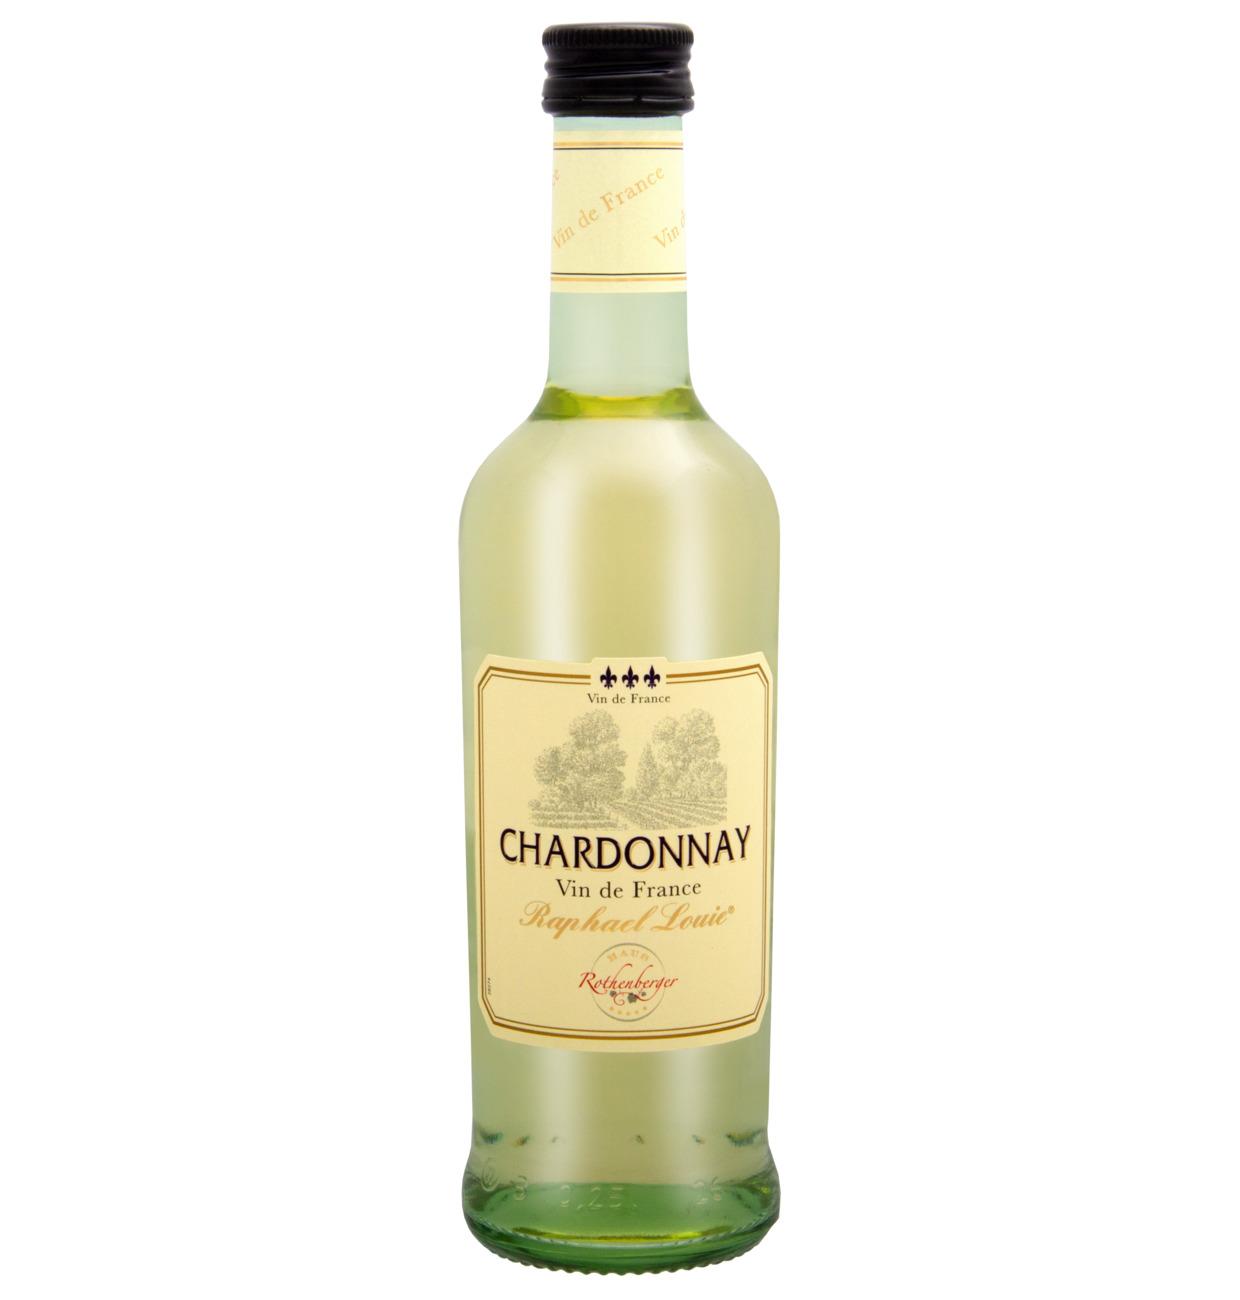 Gunz vin blanc raphael louie chardonnay sec 12 5 vol 0 25l for La fenetre chardonnay